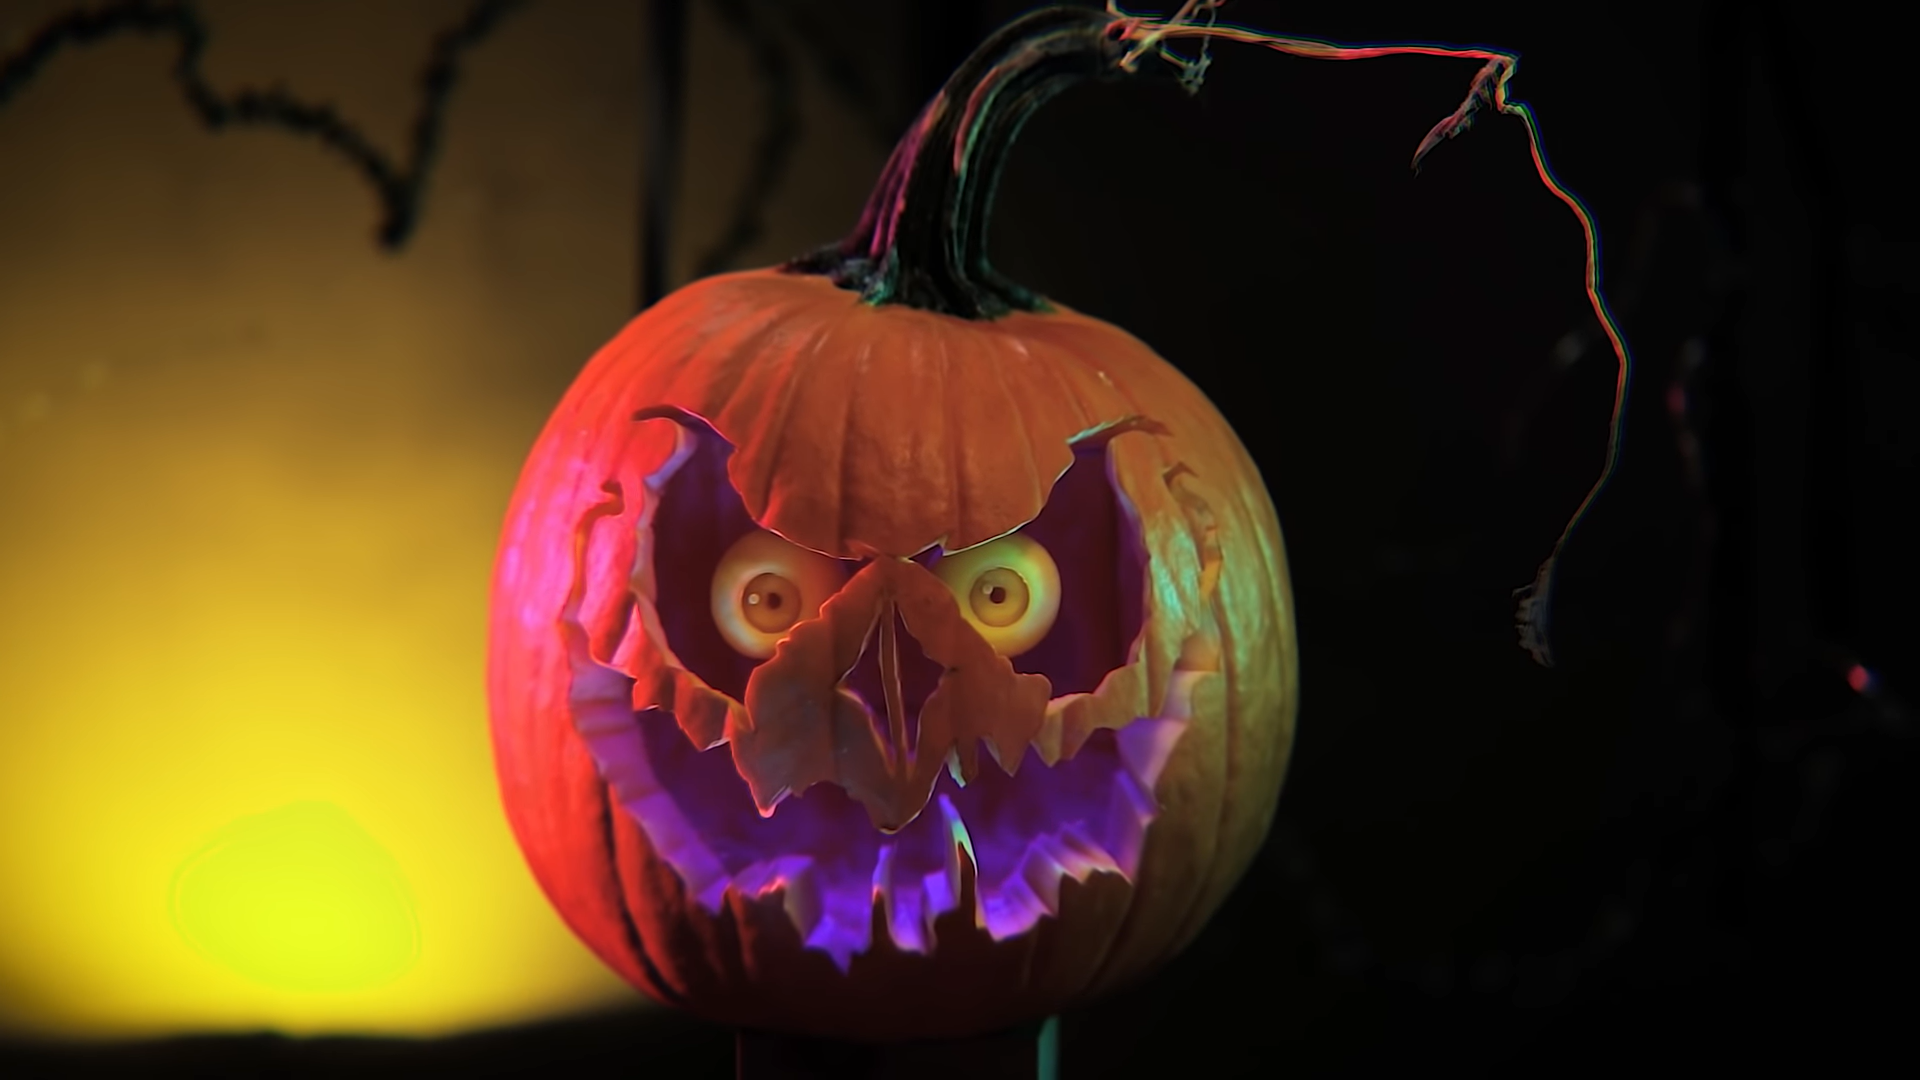 How To Carve A Jack O Lantern With Spooky Eyes Gifs Senor Gif Pronounced Gif Or Jif